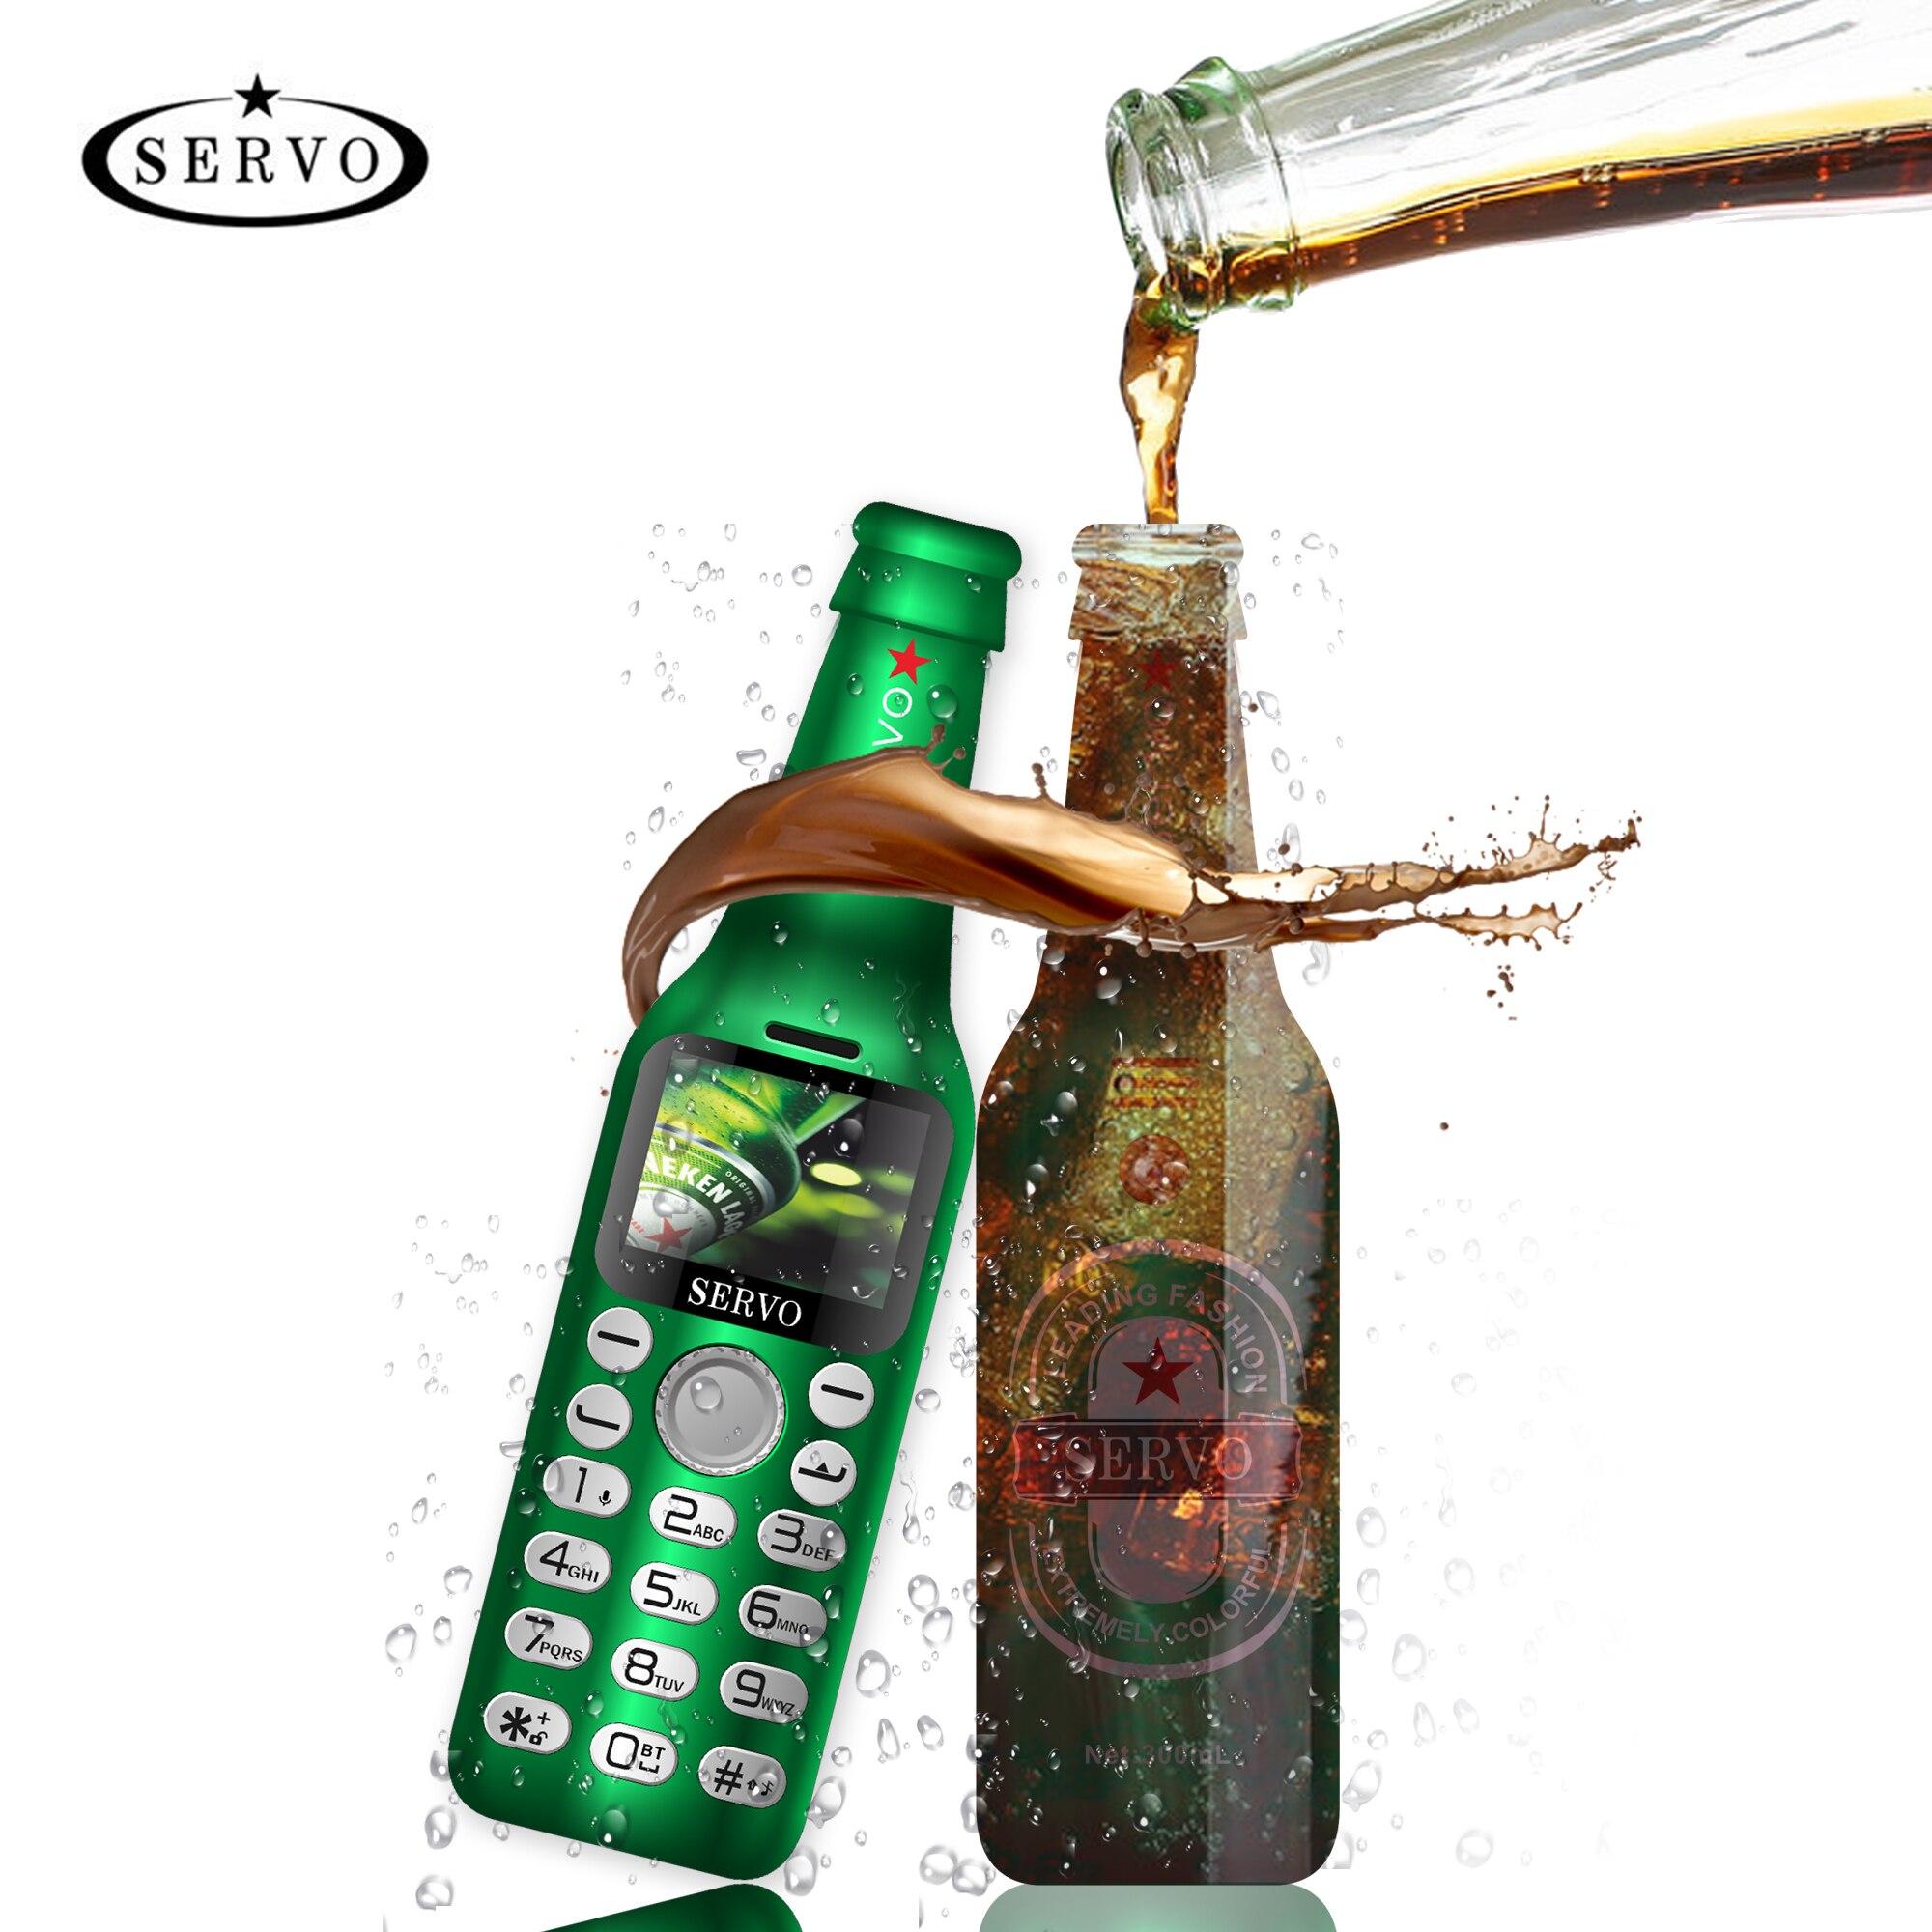 SERVO Wine bottle mini phone V8 bluetooth Dialer HD Telephone magic voice one key recorder small mobile phone Russian language